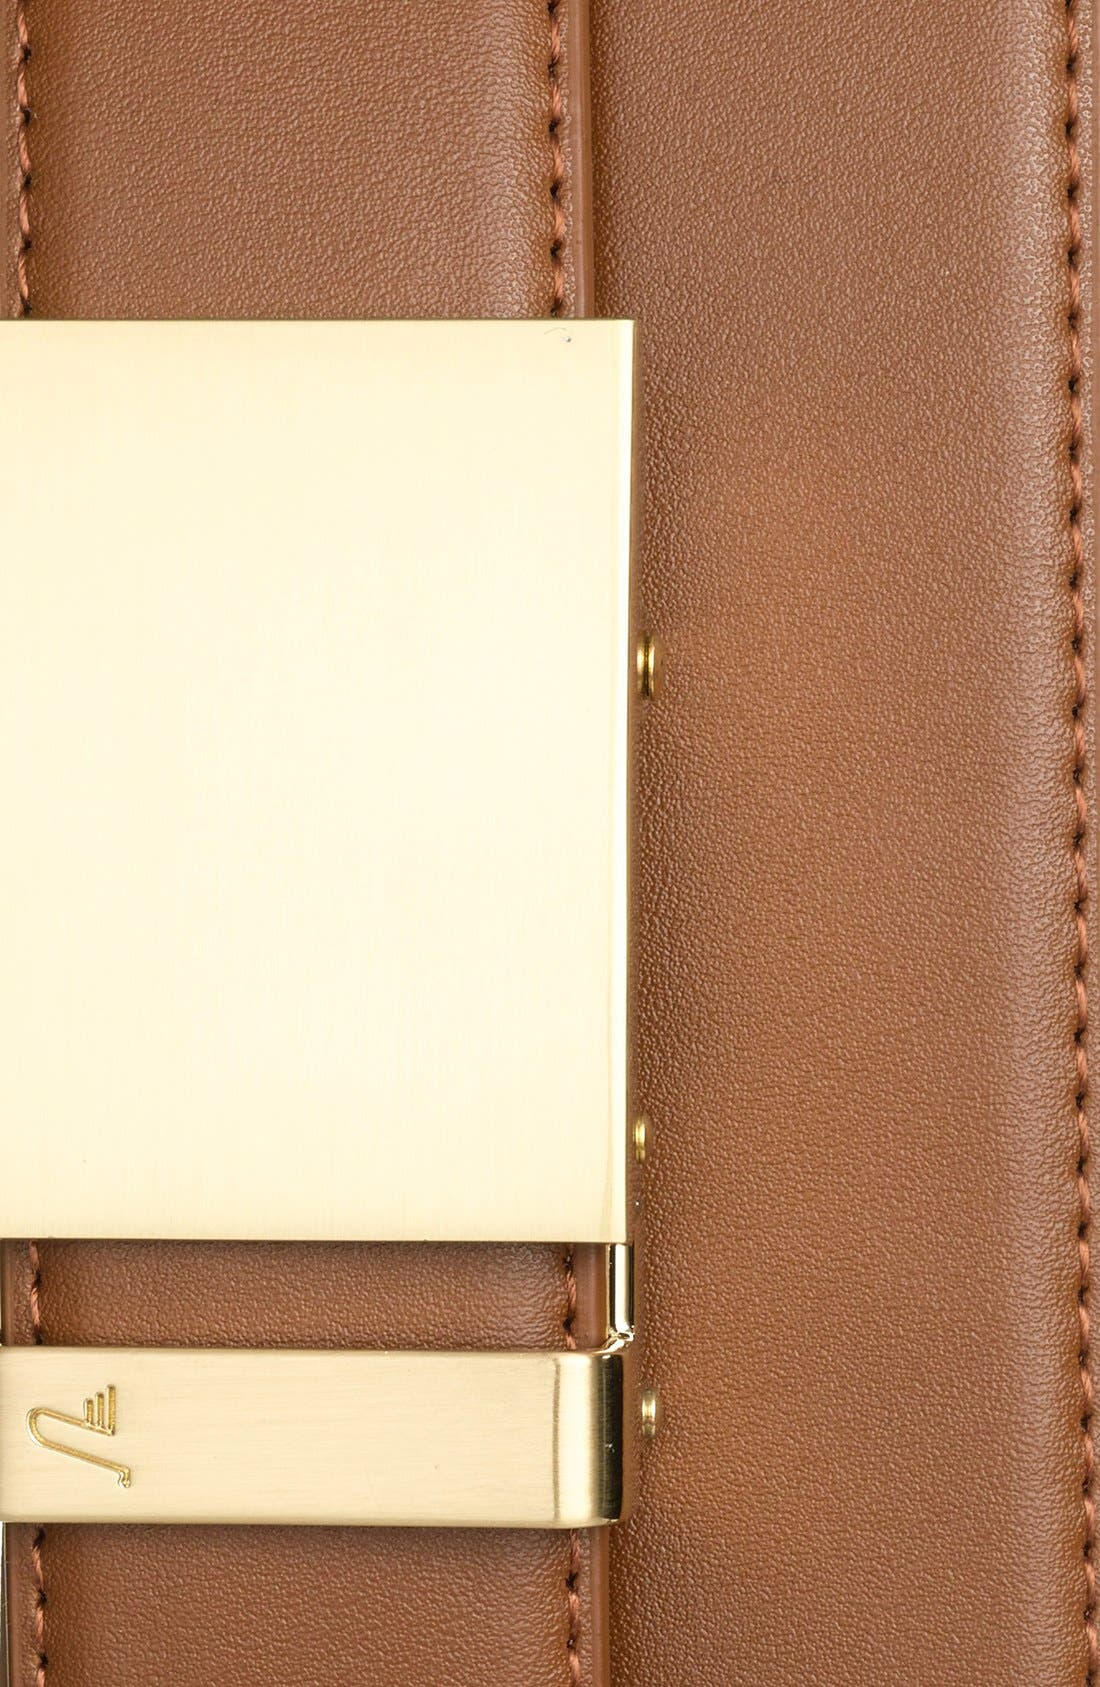 'Gold' Leather Belt,                             Alternate thumbnail 2, color,                             GOLD/ TAN